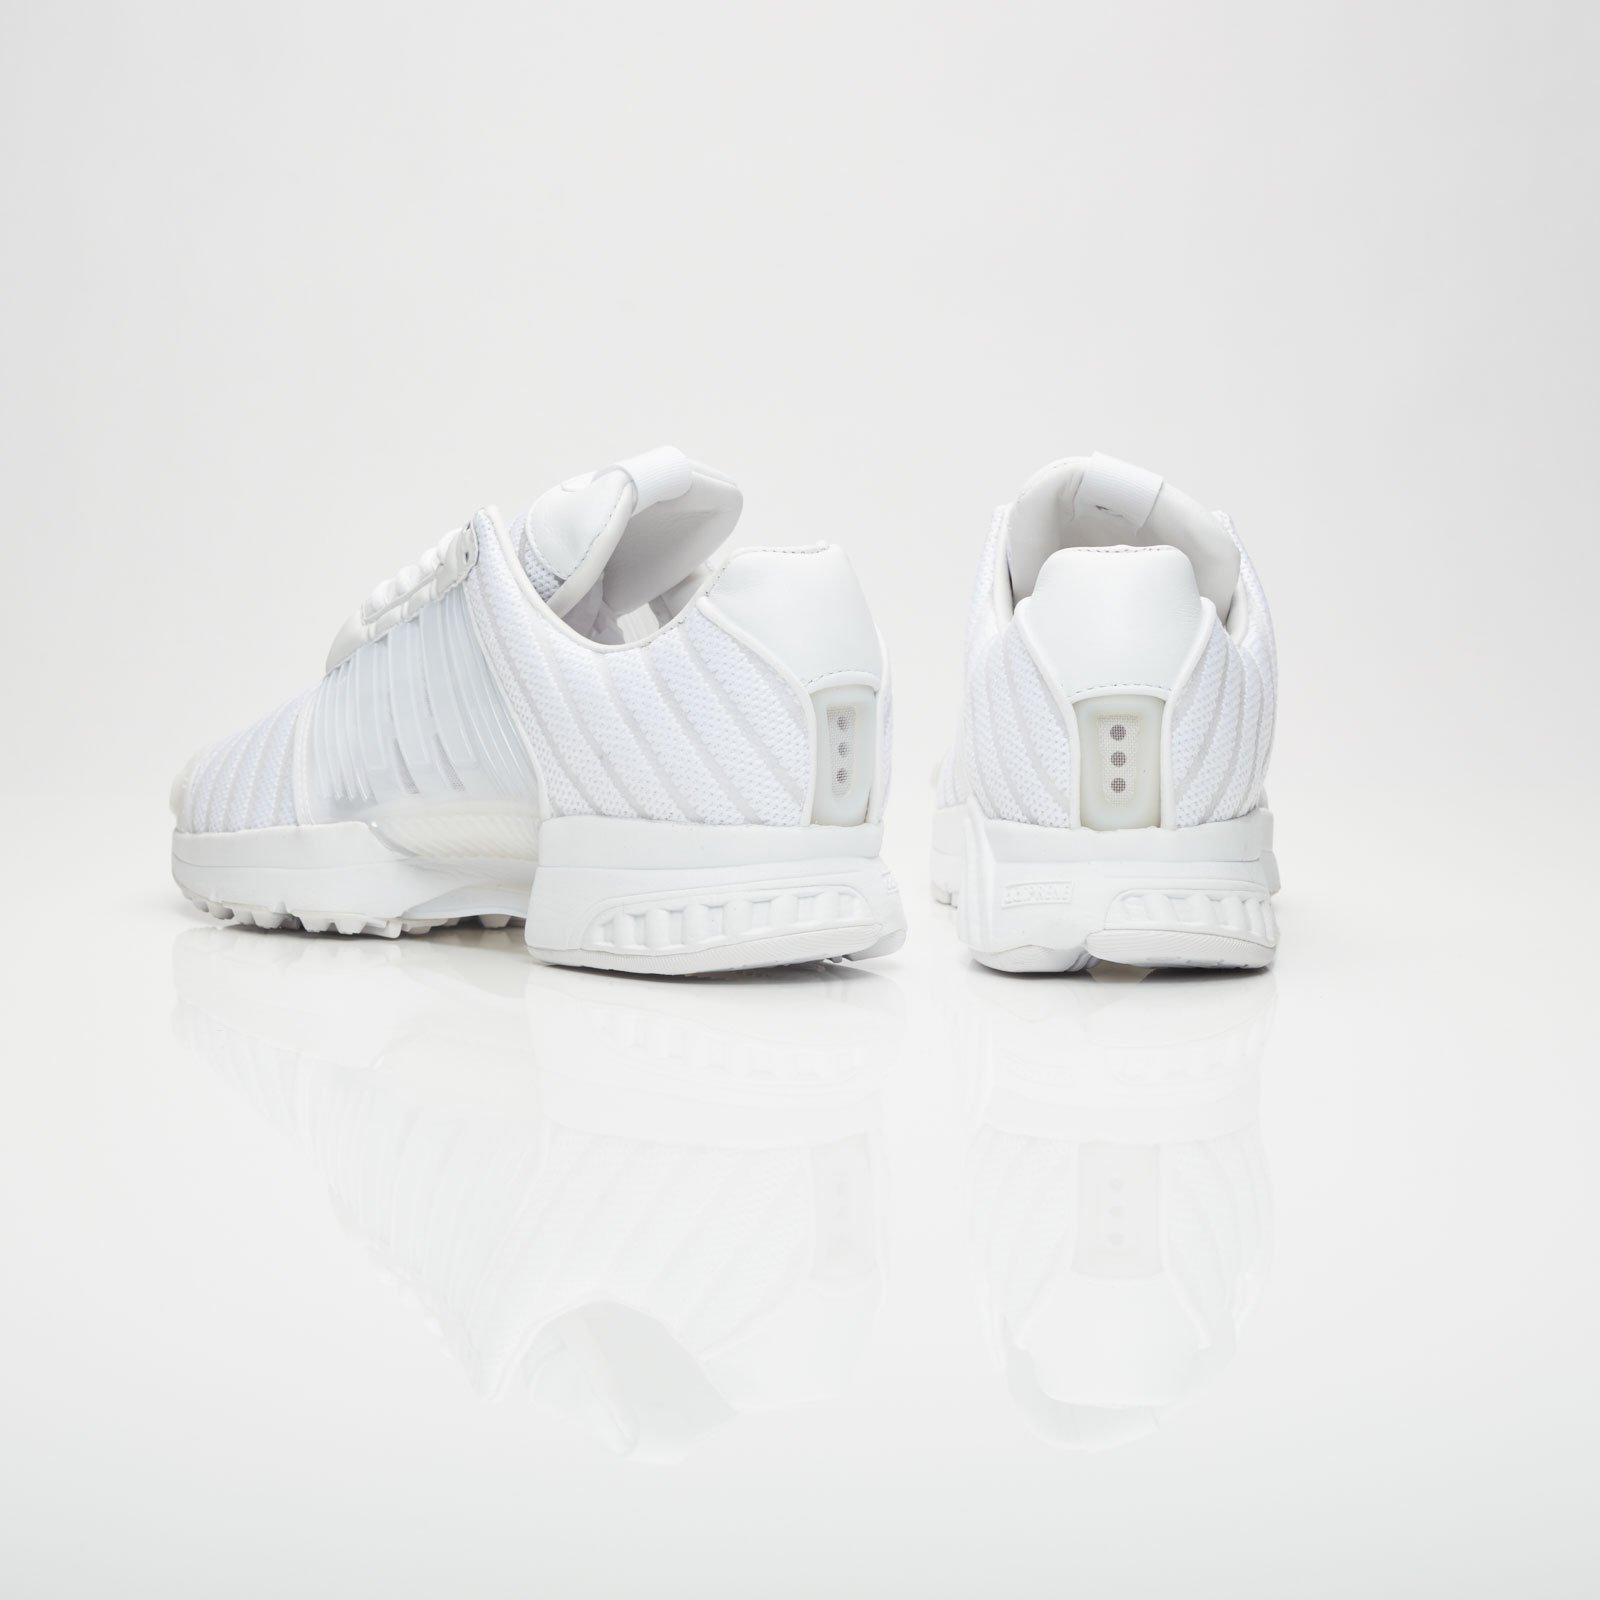 new concept c8ff2 b938b adidas Climacool 1 PK | SNEAKERBOY & WISH - By3053 ...